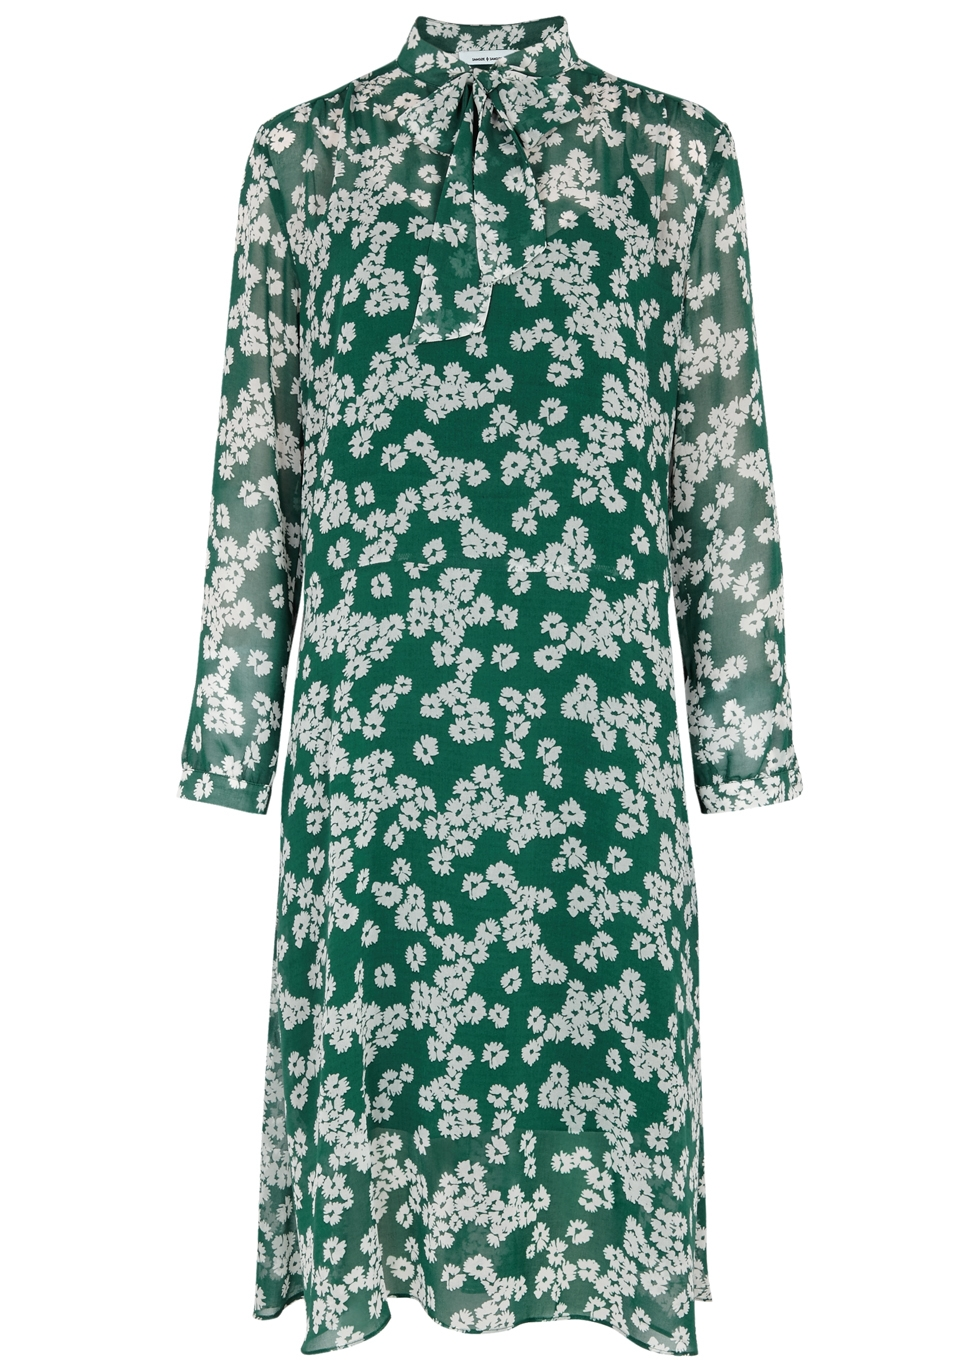 SAMS0E & SAMS0E Merritt Daisy-Print Chiffon Dress in Green